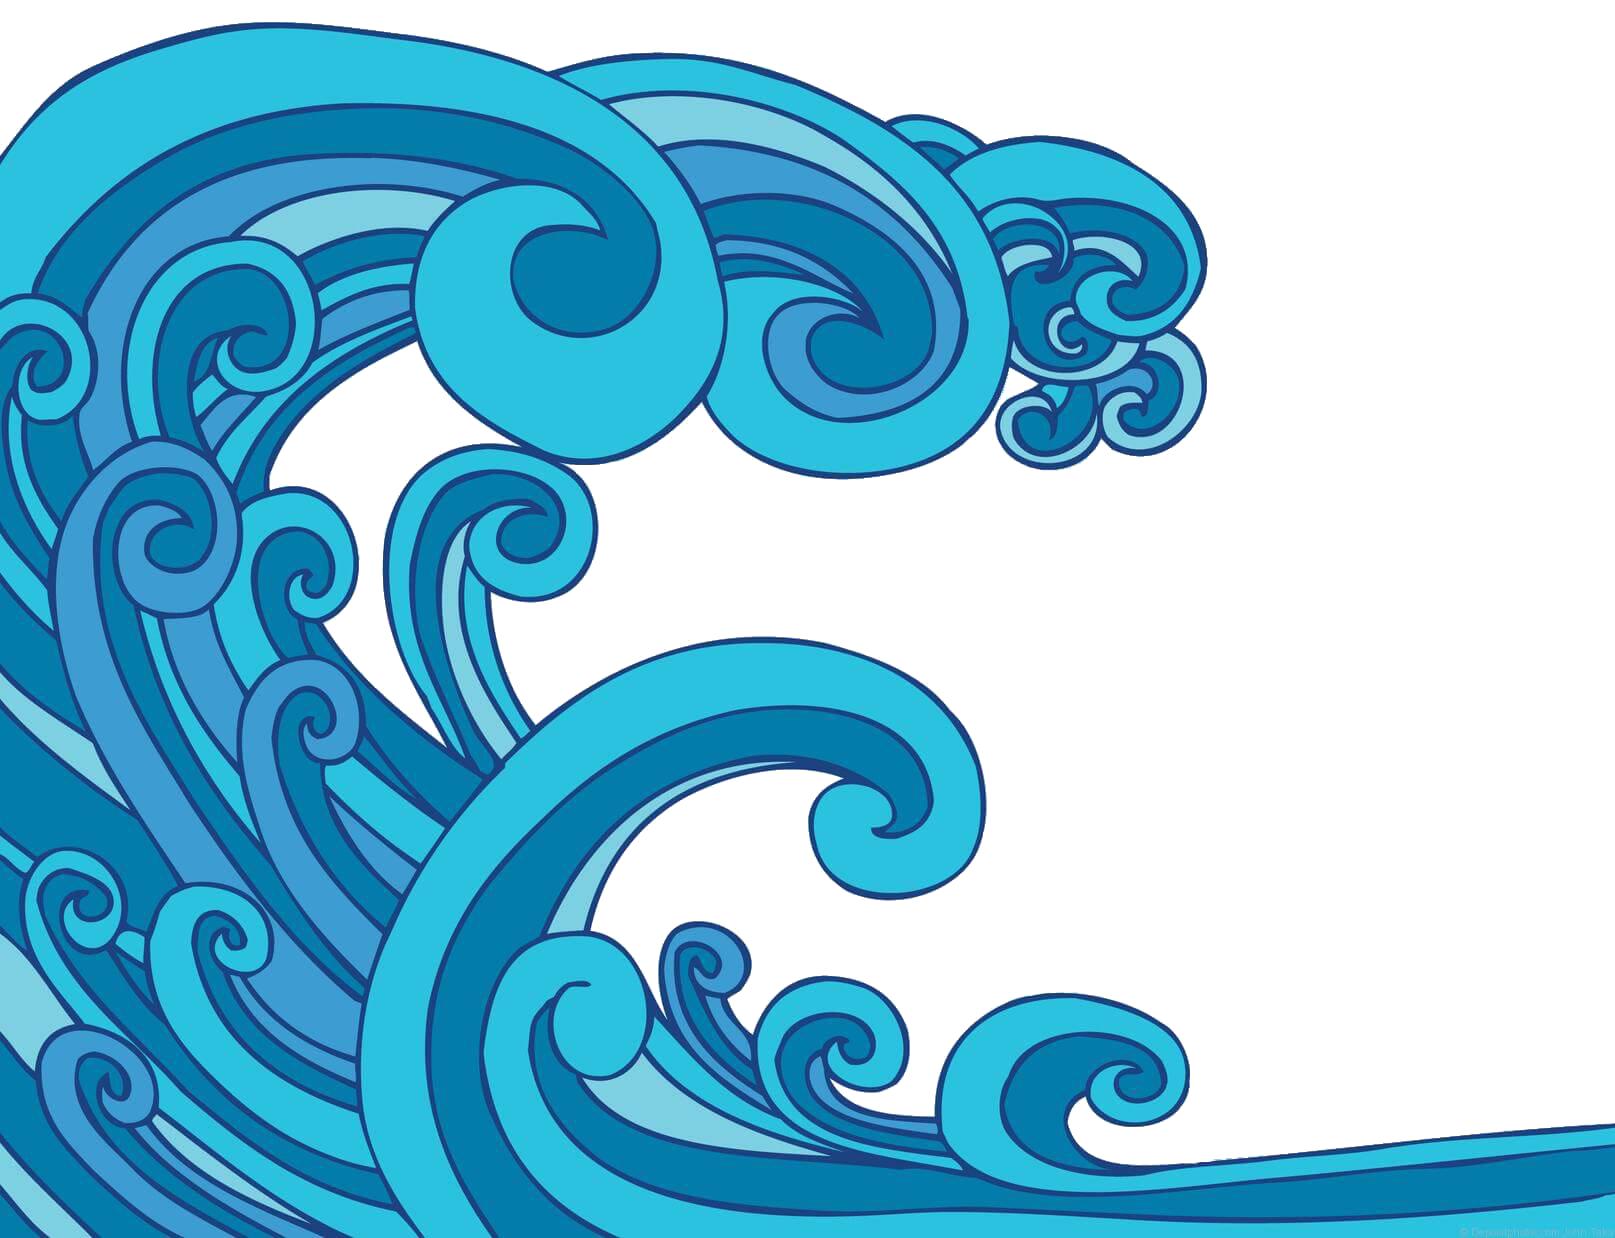 Download Tsunami PNG Transparent Image.